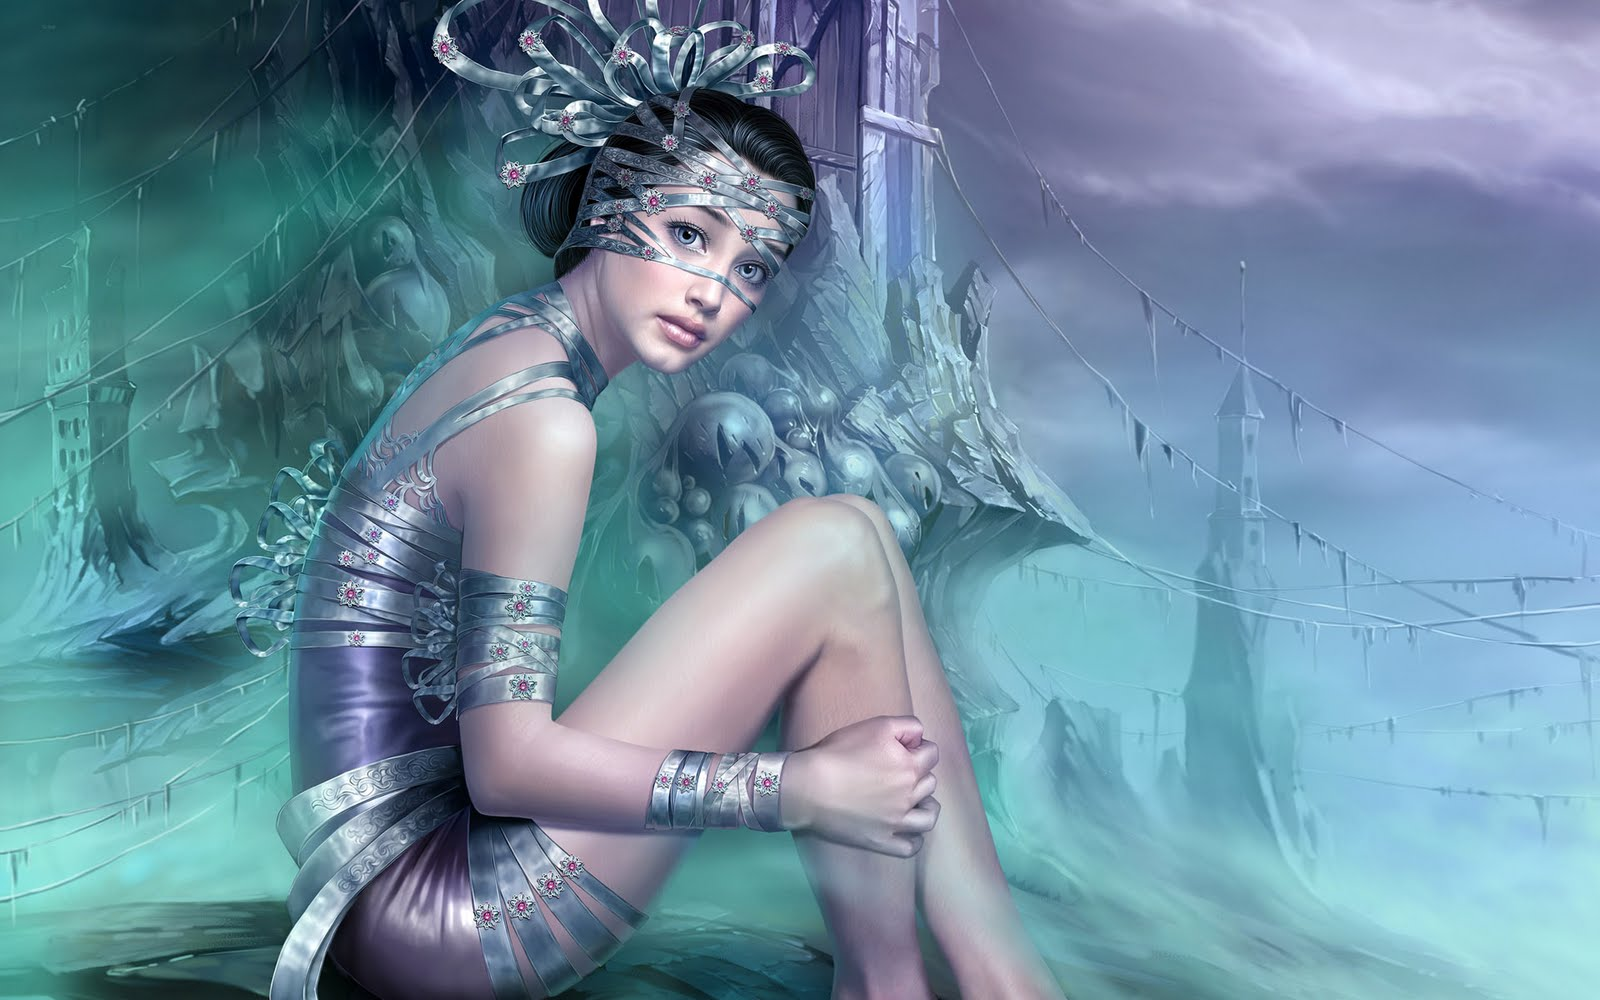 New Art Funny Wallpapers Jokes Fantasy girl Pc desktop HD 1600x1000